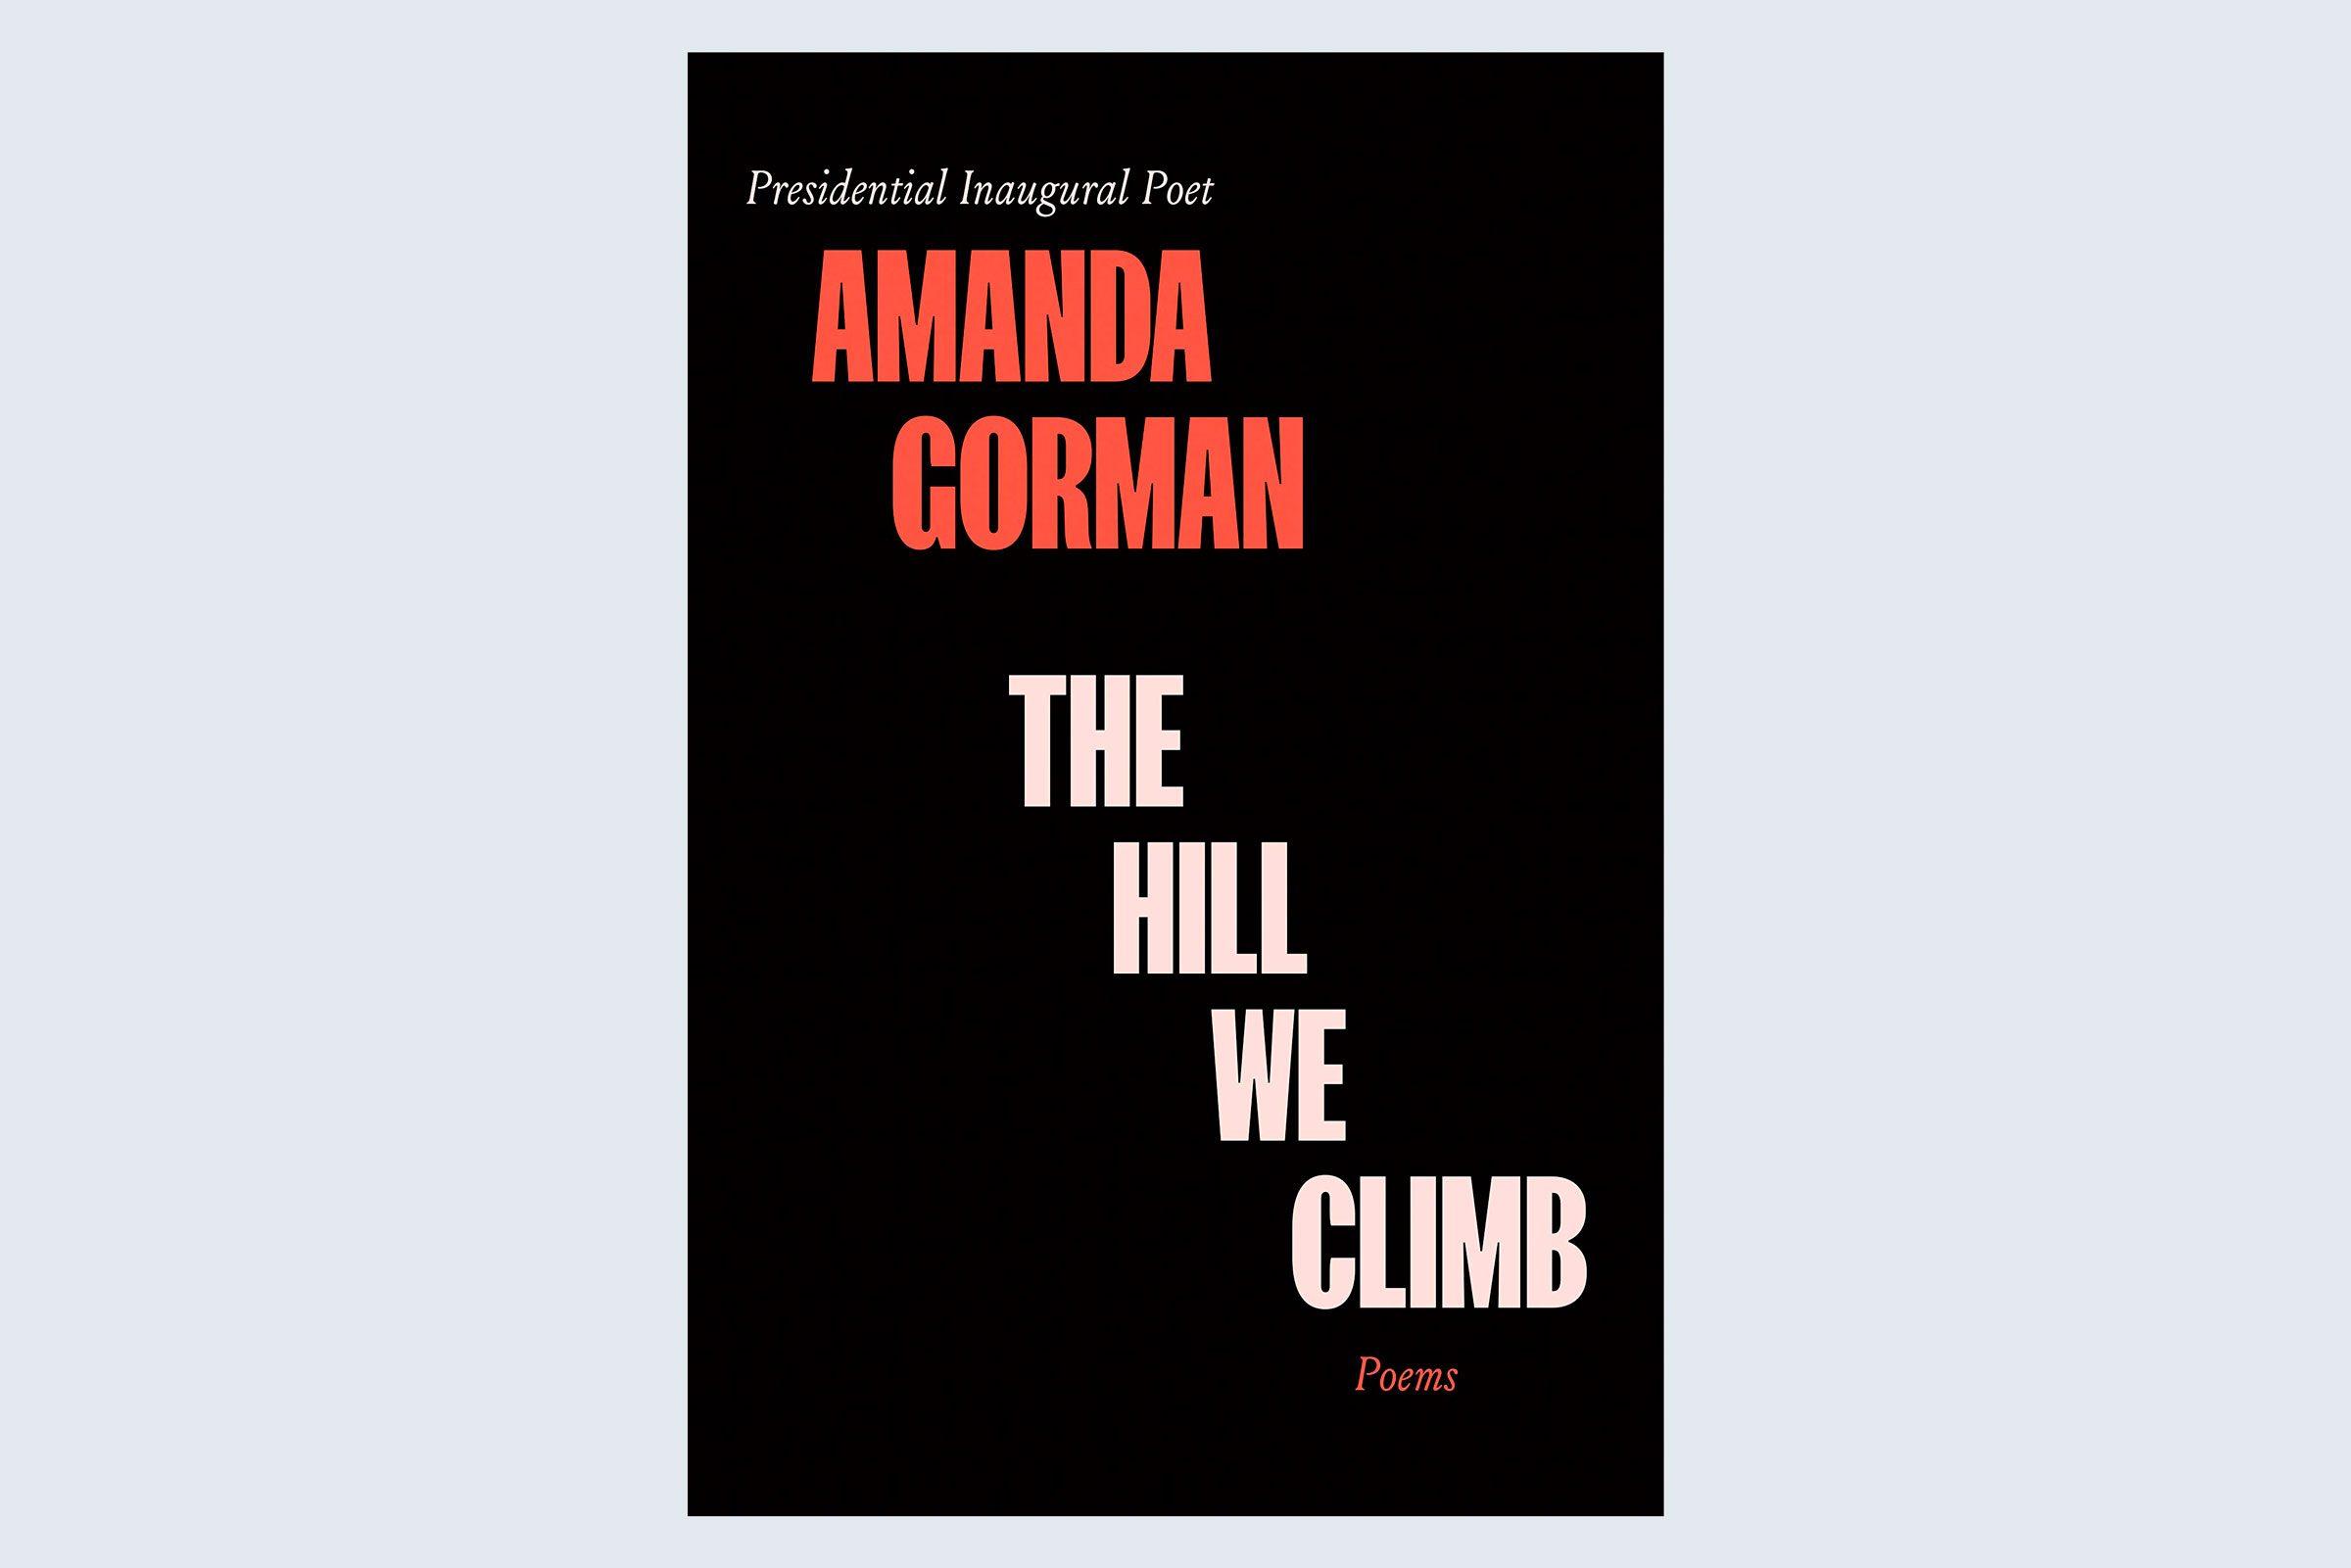 The Hill We Climb: Poems by Amanda Gorman